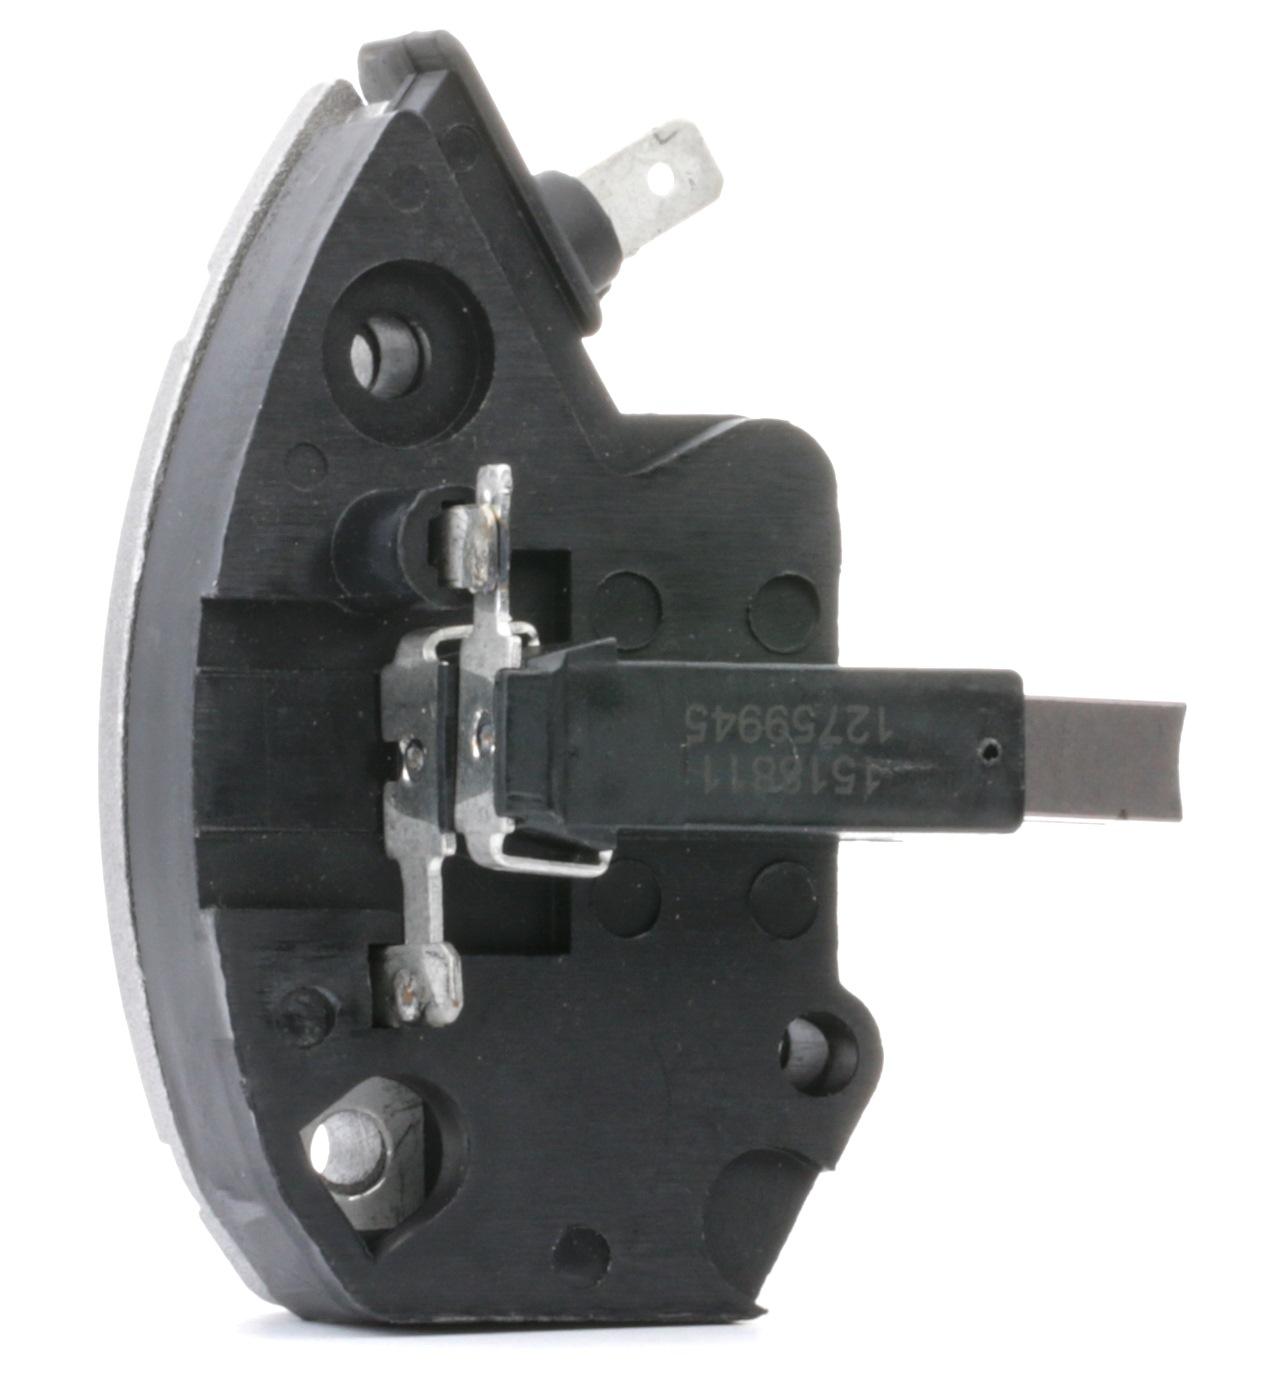 NISSAN VERSA Generatorregler - Original RIDEX 288R0012 Nennspannung: 12V, Betriebsspannung: 14,5V